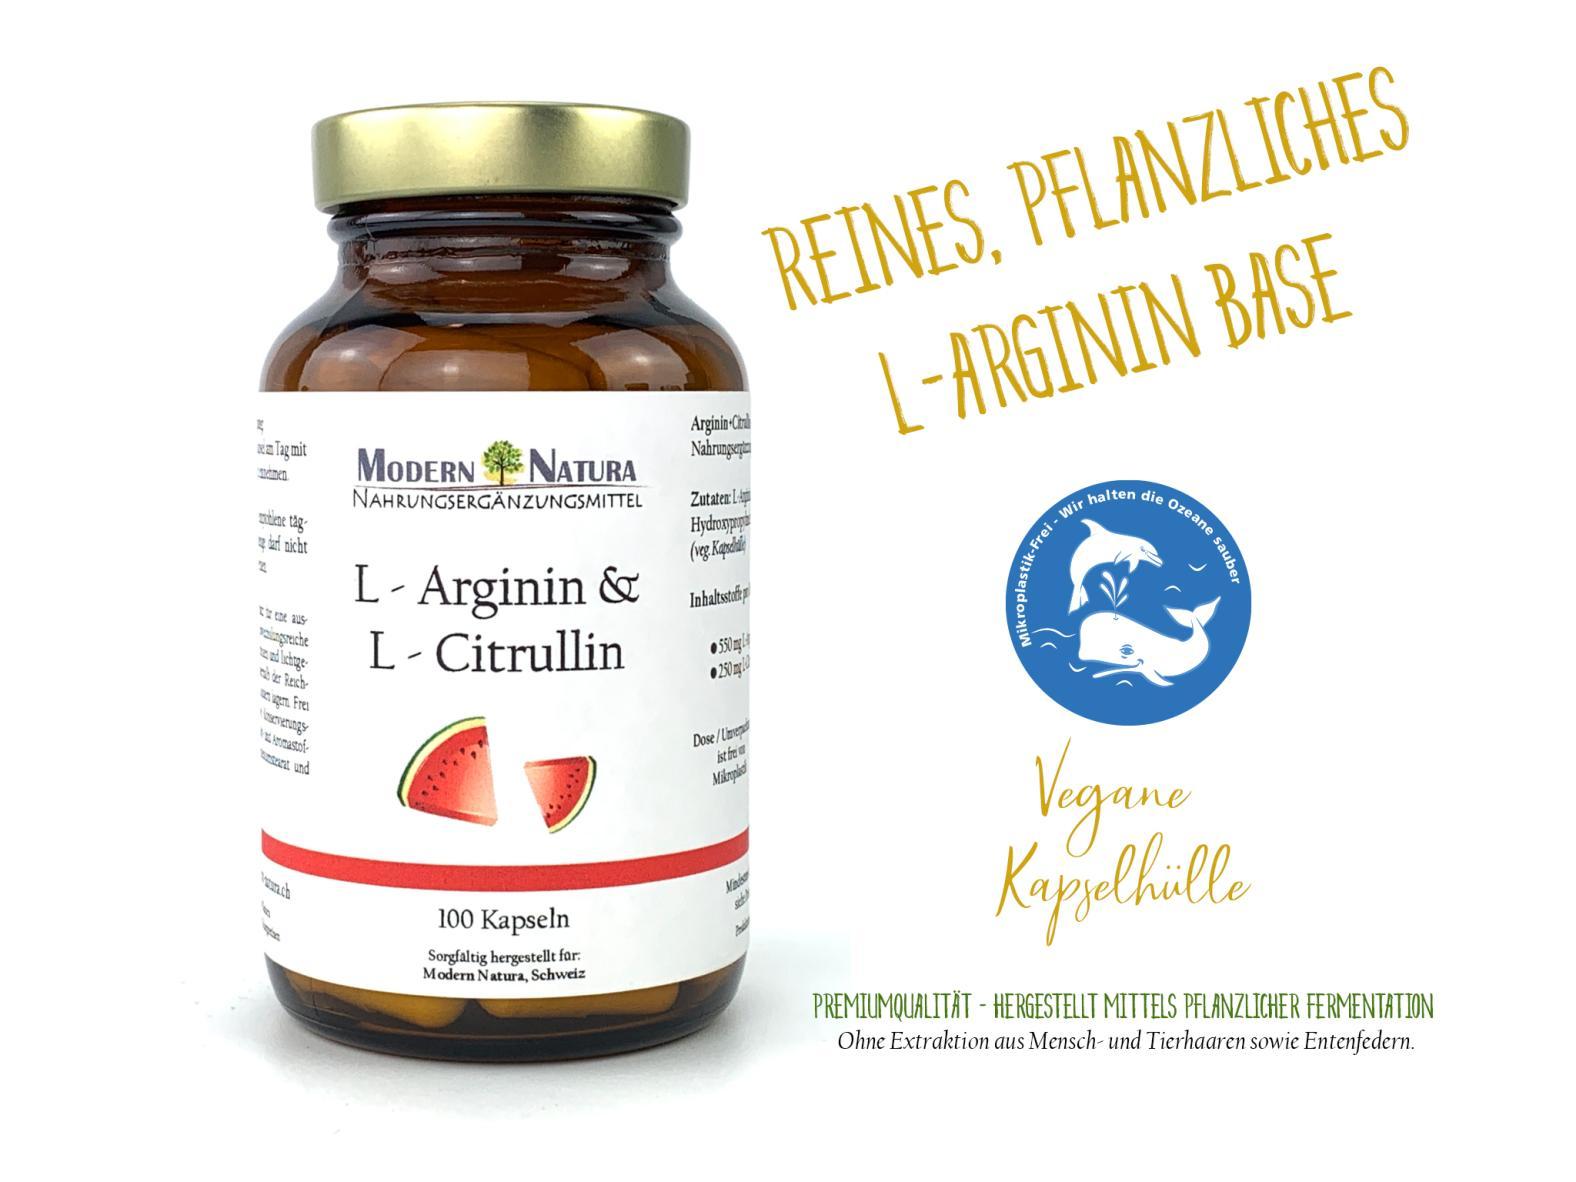 L-Arginin & L-Citrullin - 100 Kapseln - Vegan & Glutenfrei - Reines L-Arginin Base